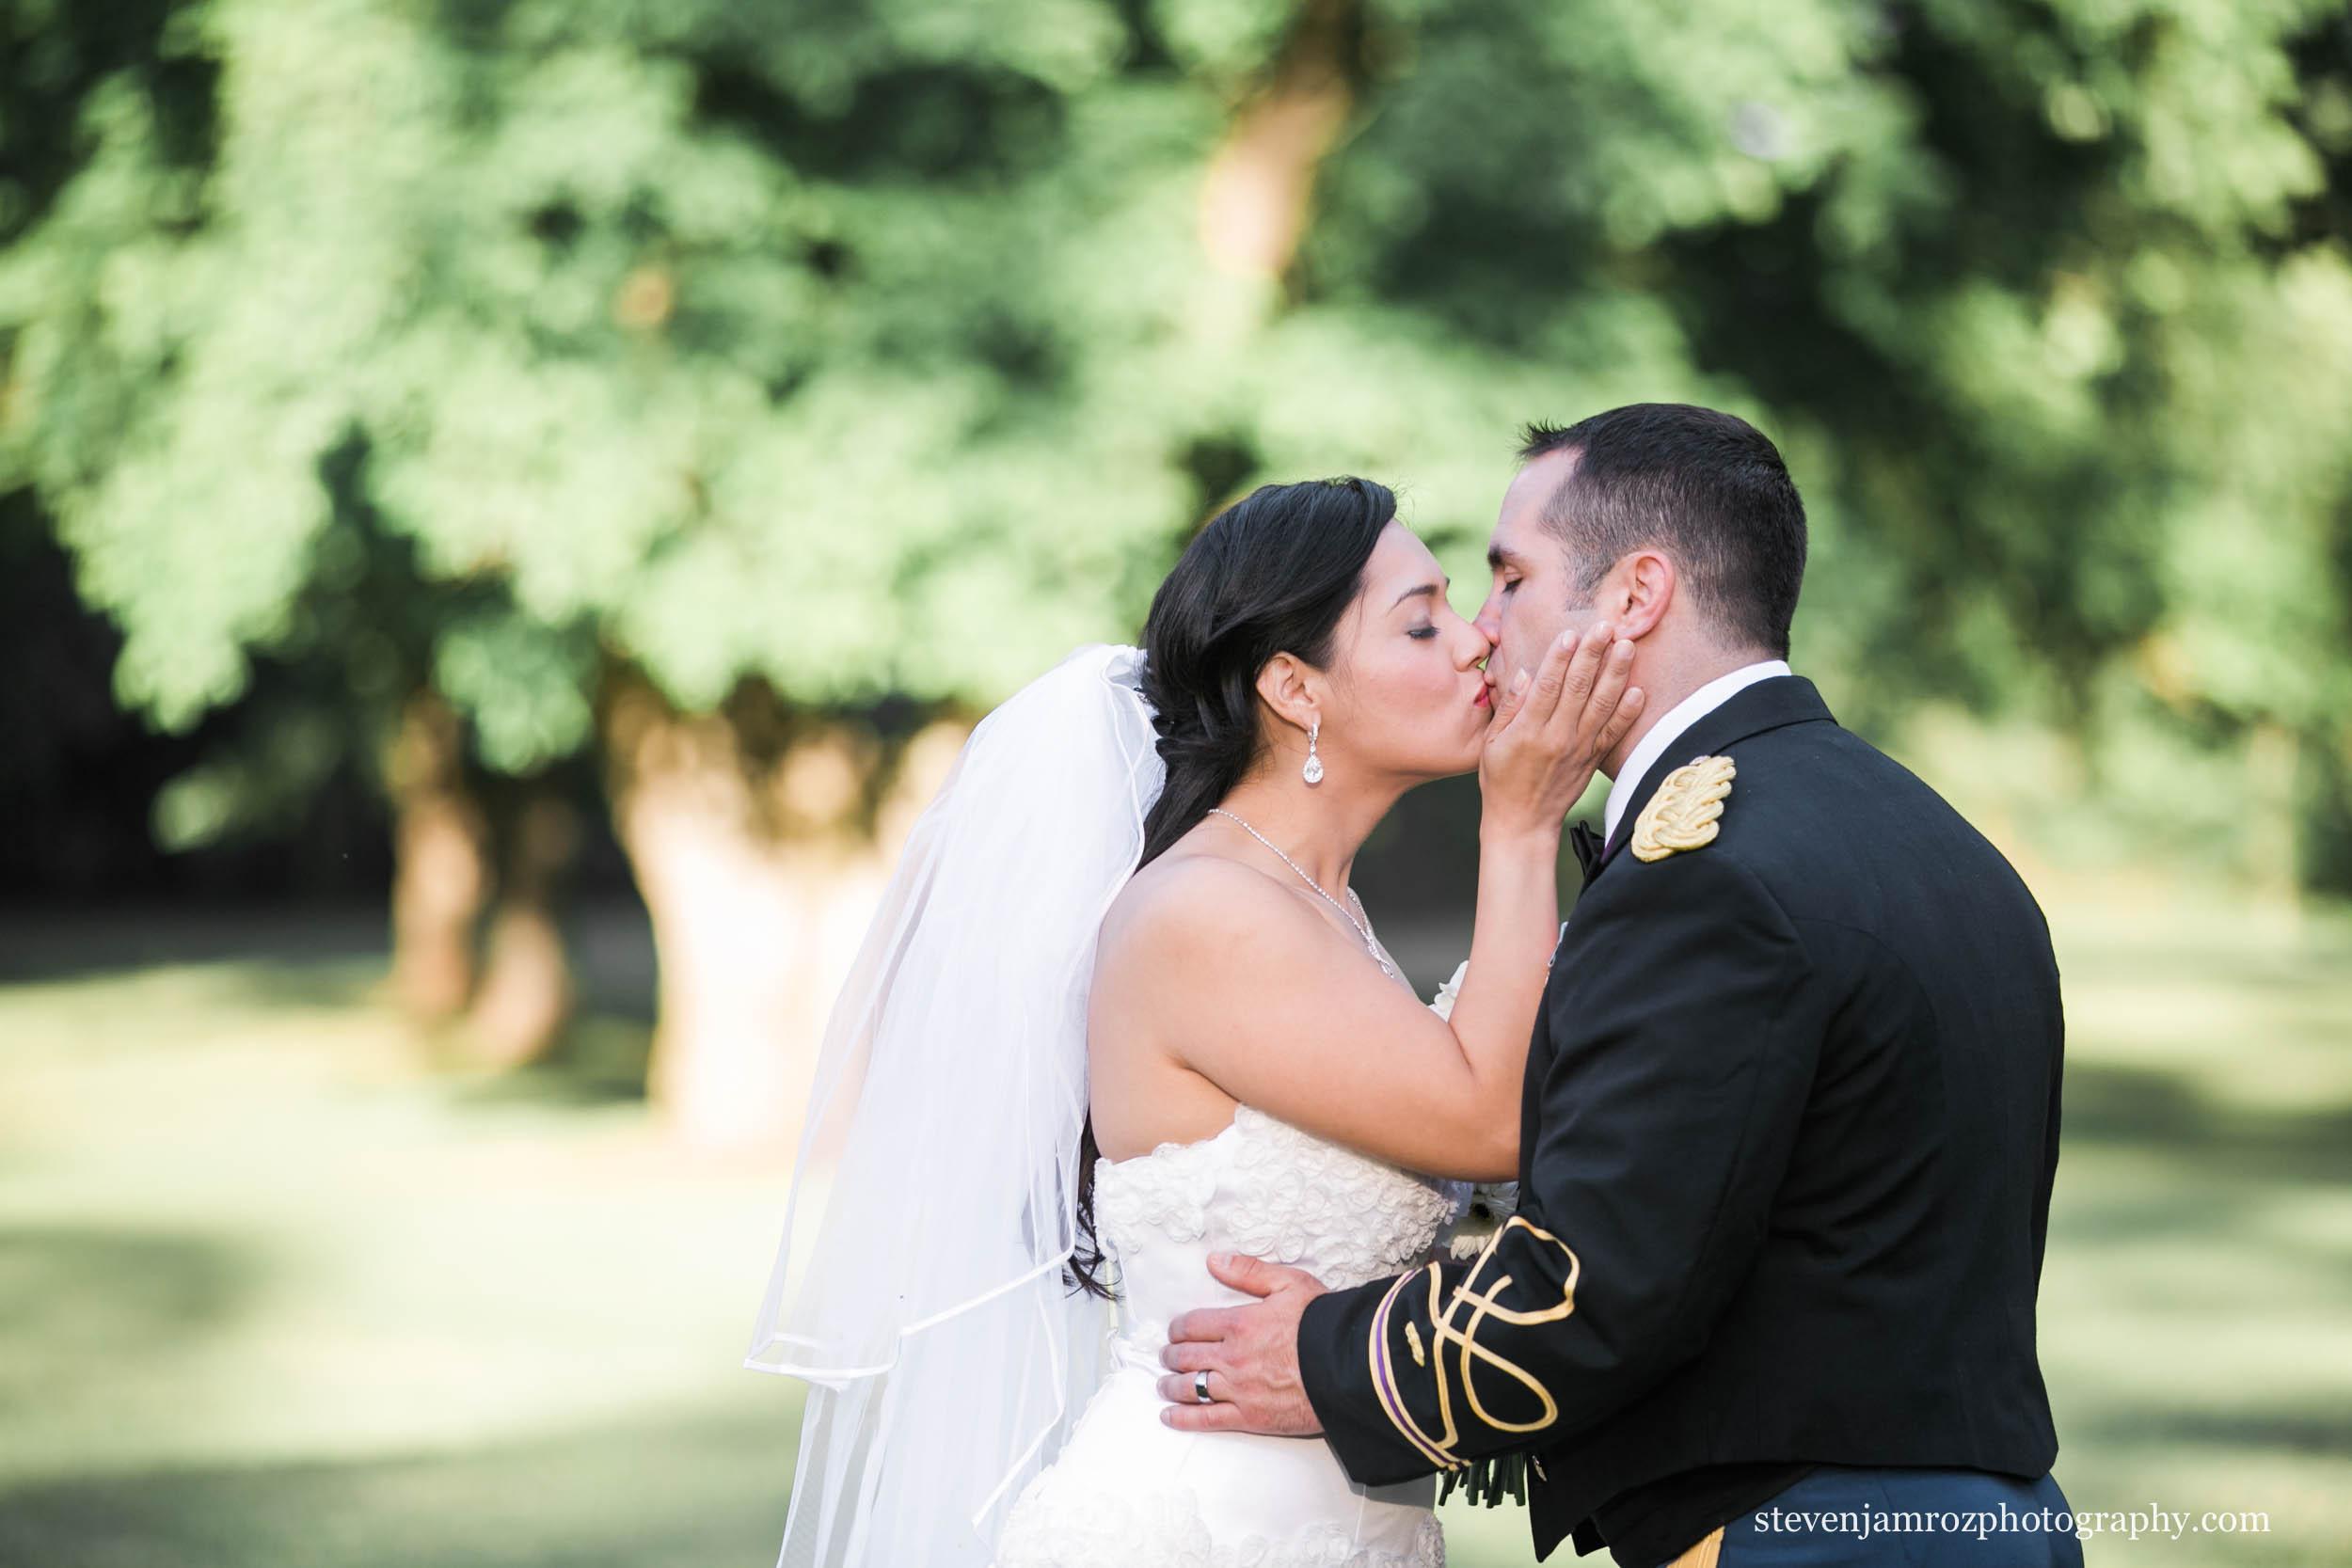 kissing-couple-wedding-raleigh-steven-jamroz-photography-0316.jpg